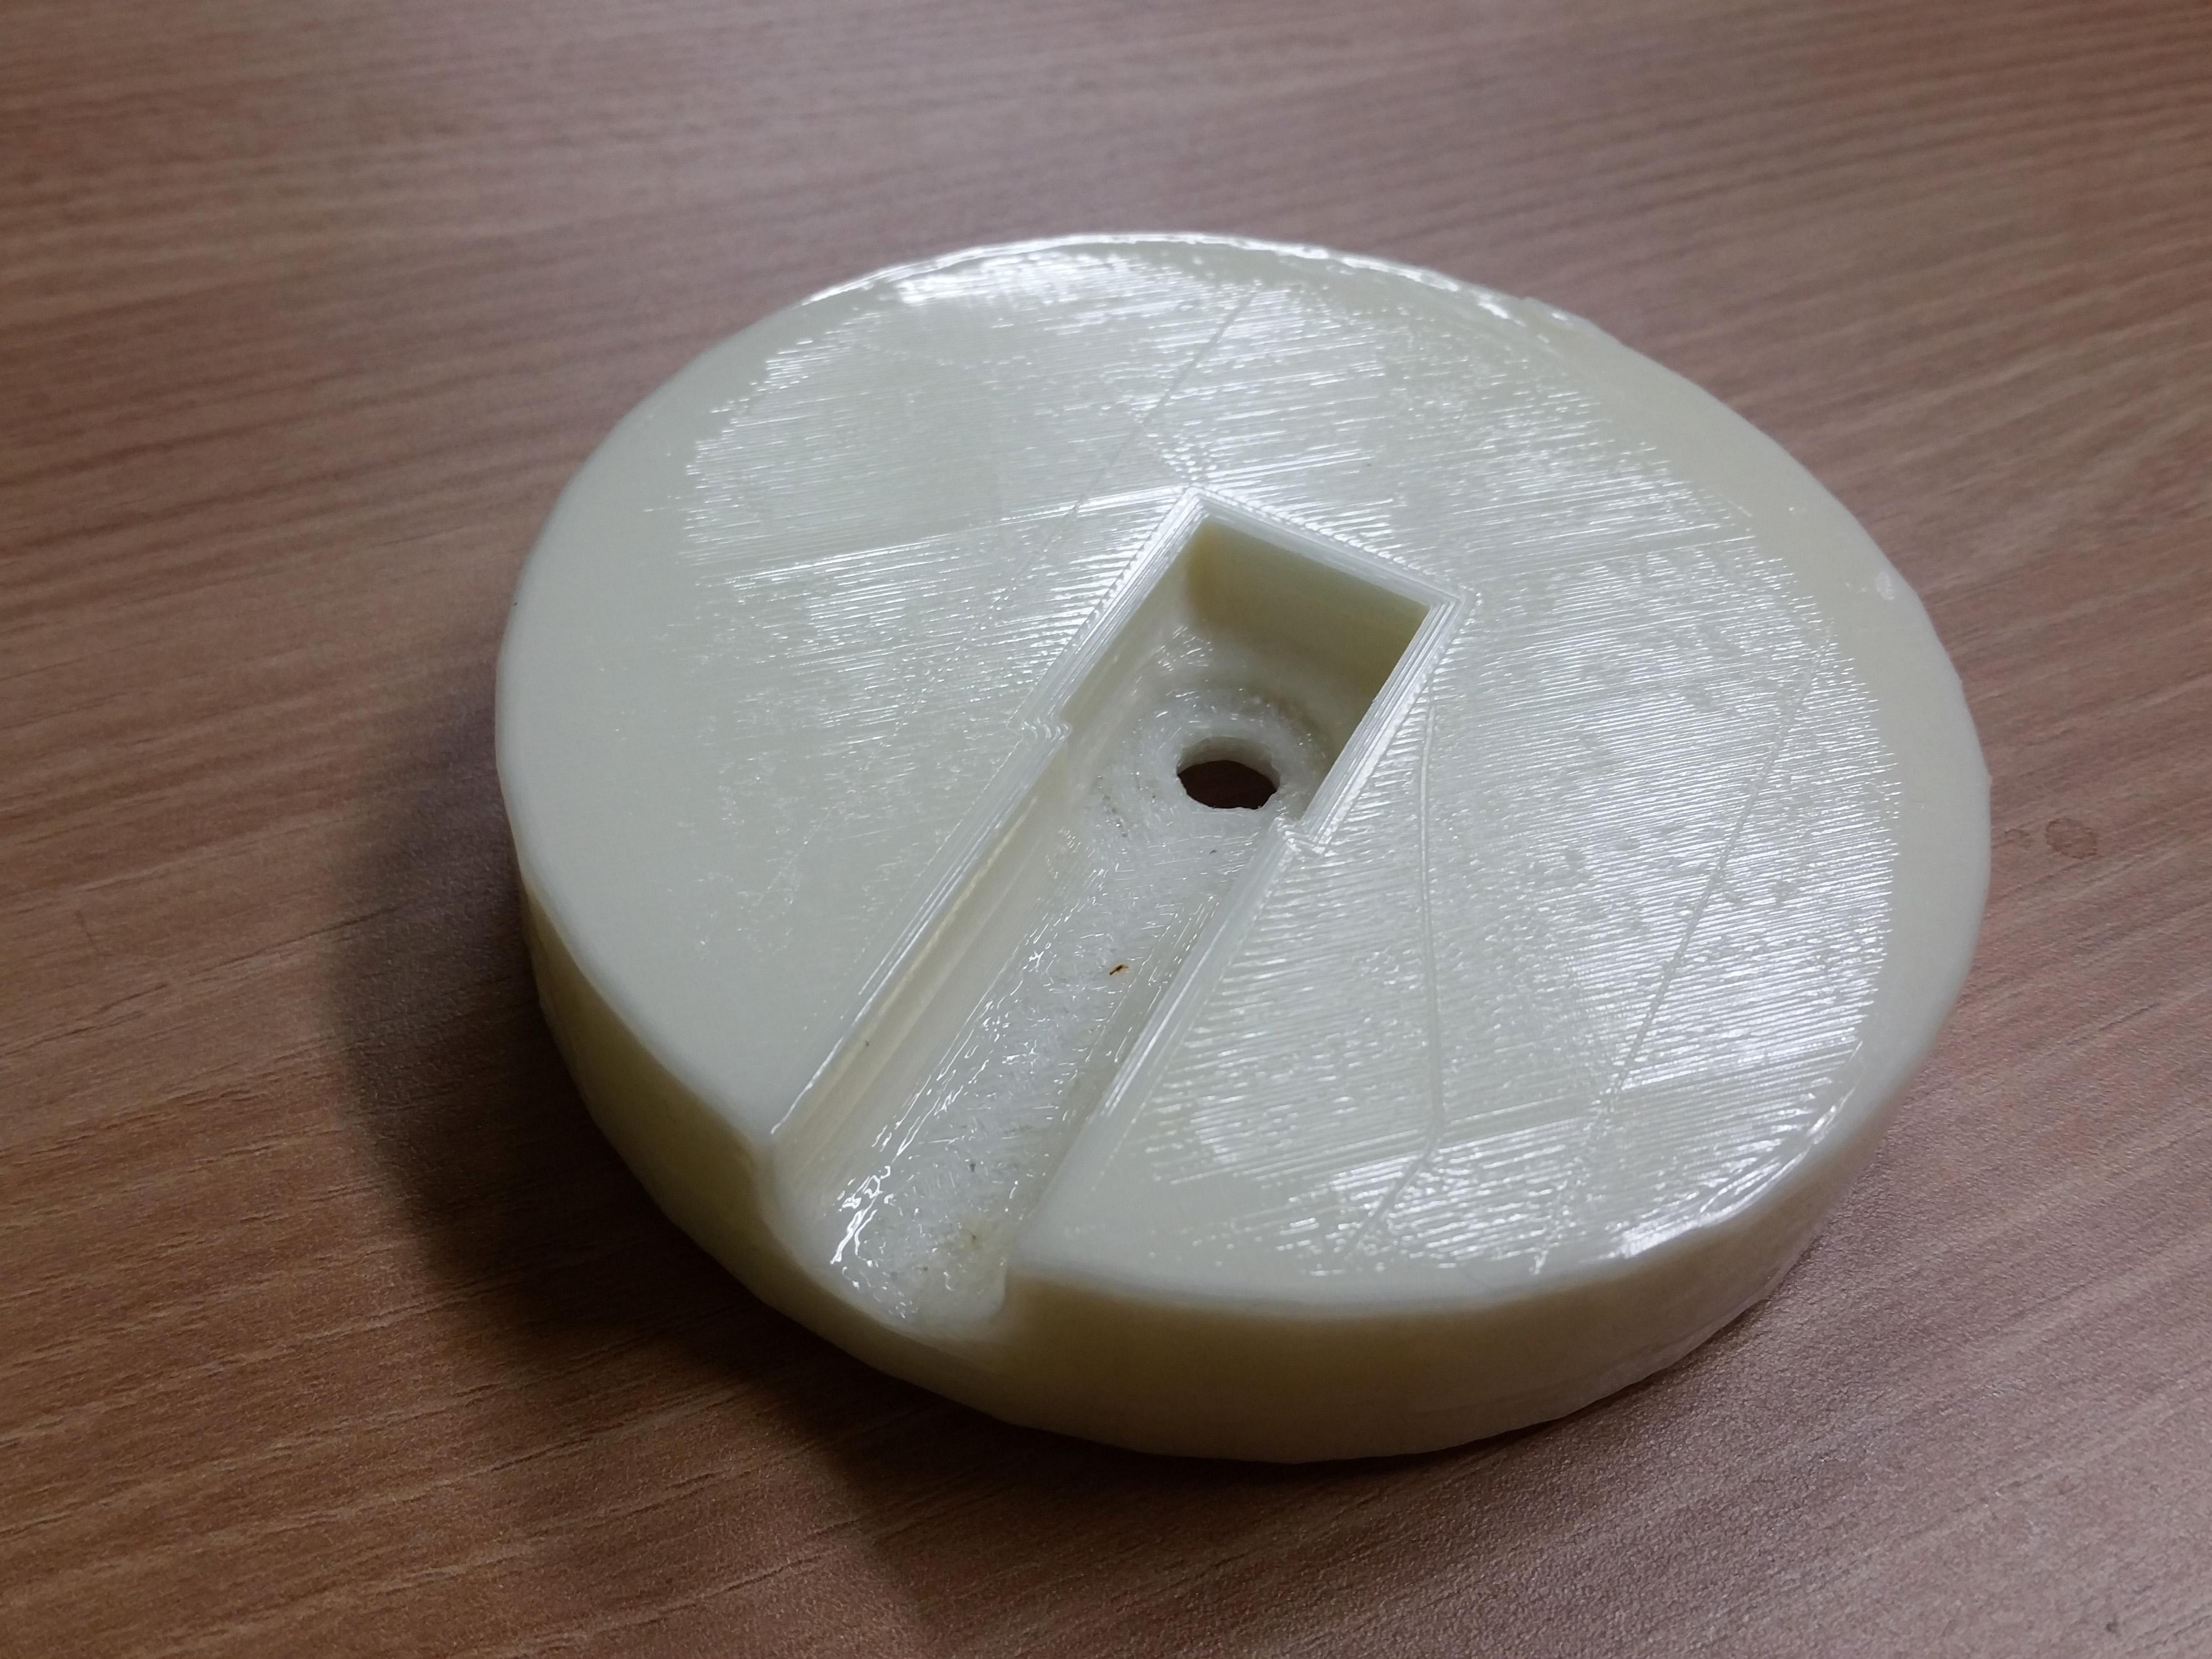 20141015_181841.jpg Download free STL file RGB LED Coaster • 3D printing object, Glutnard